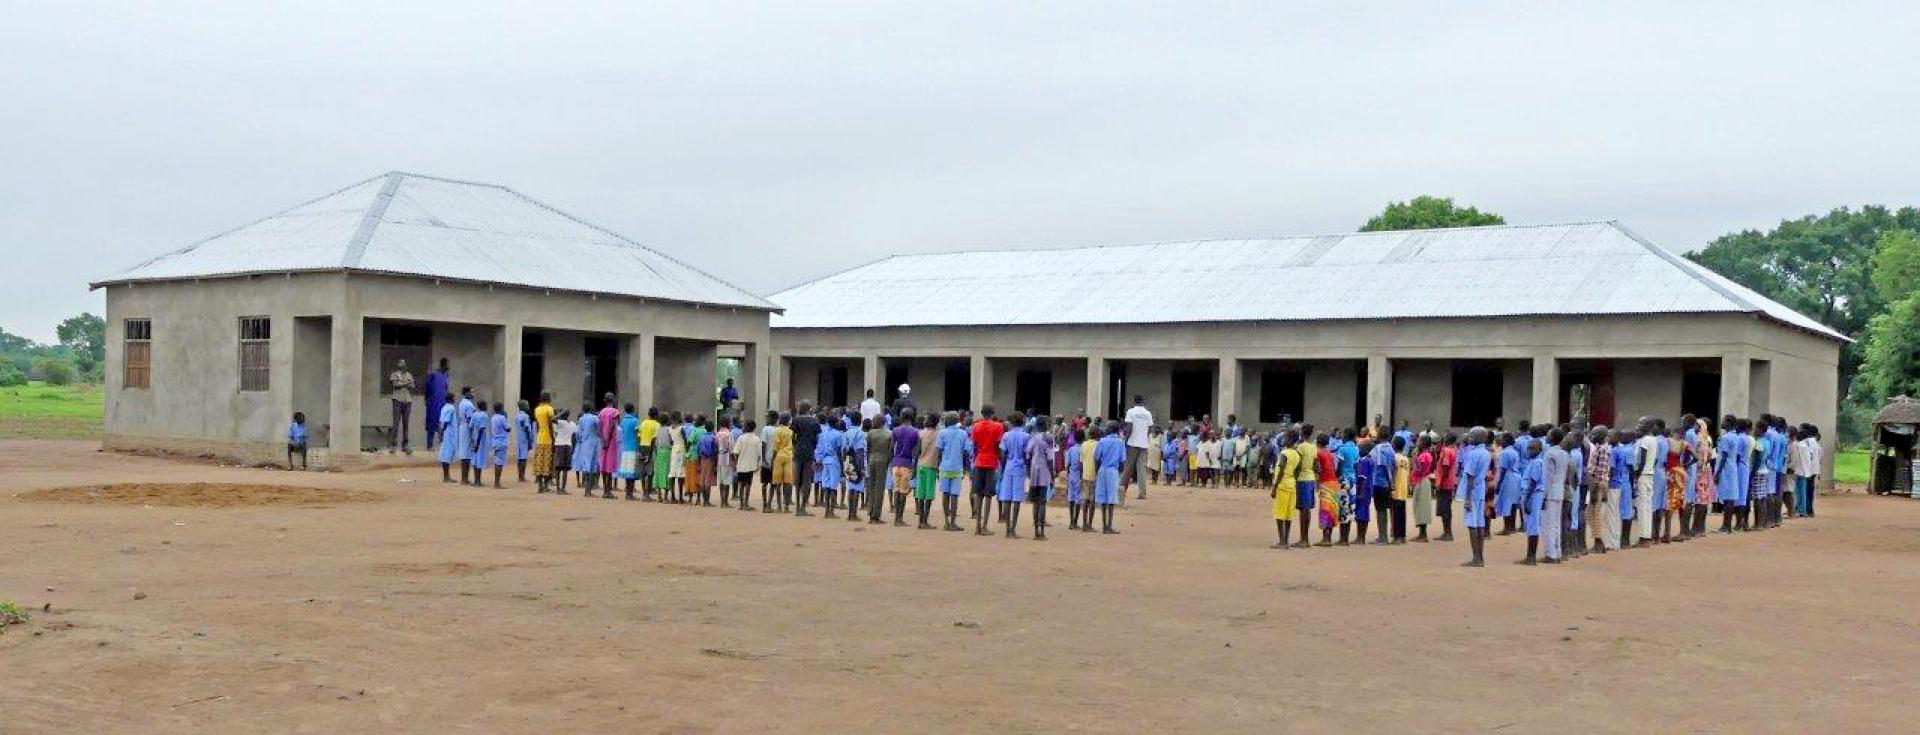 Schule Aroyo (Sudan)